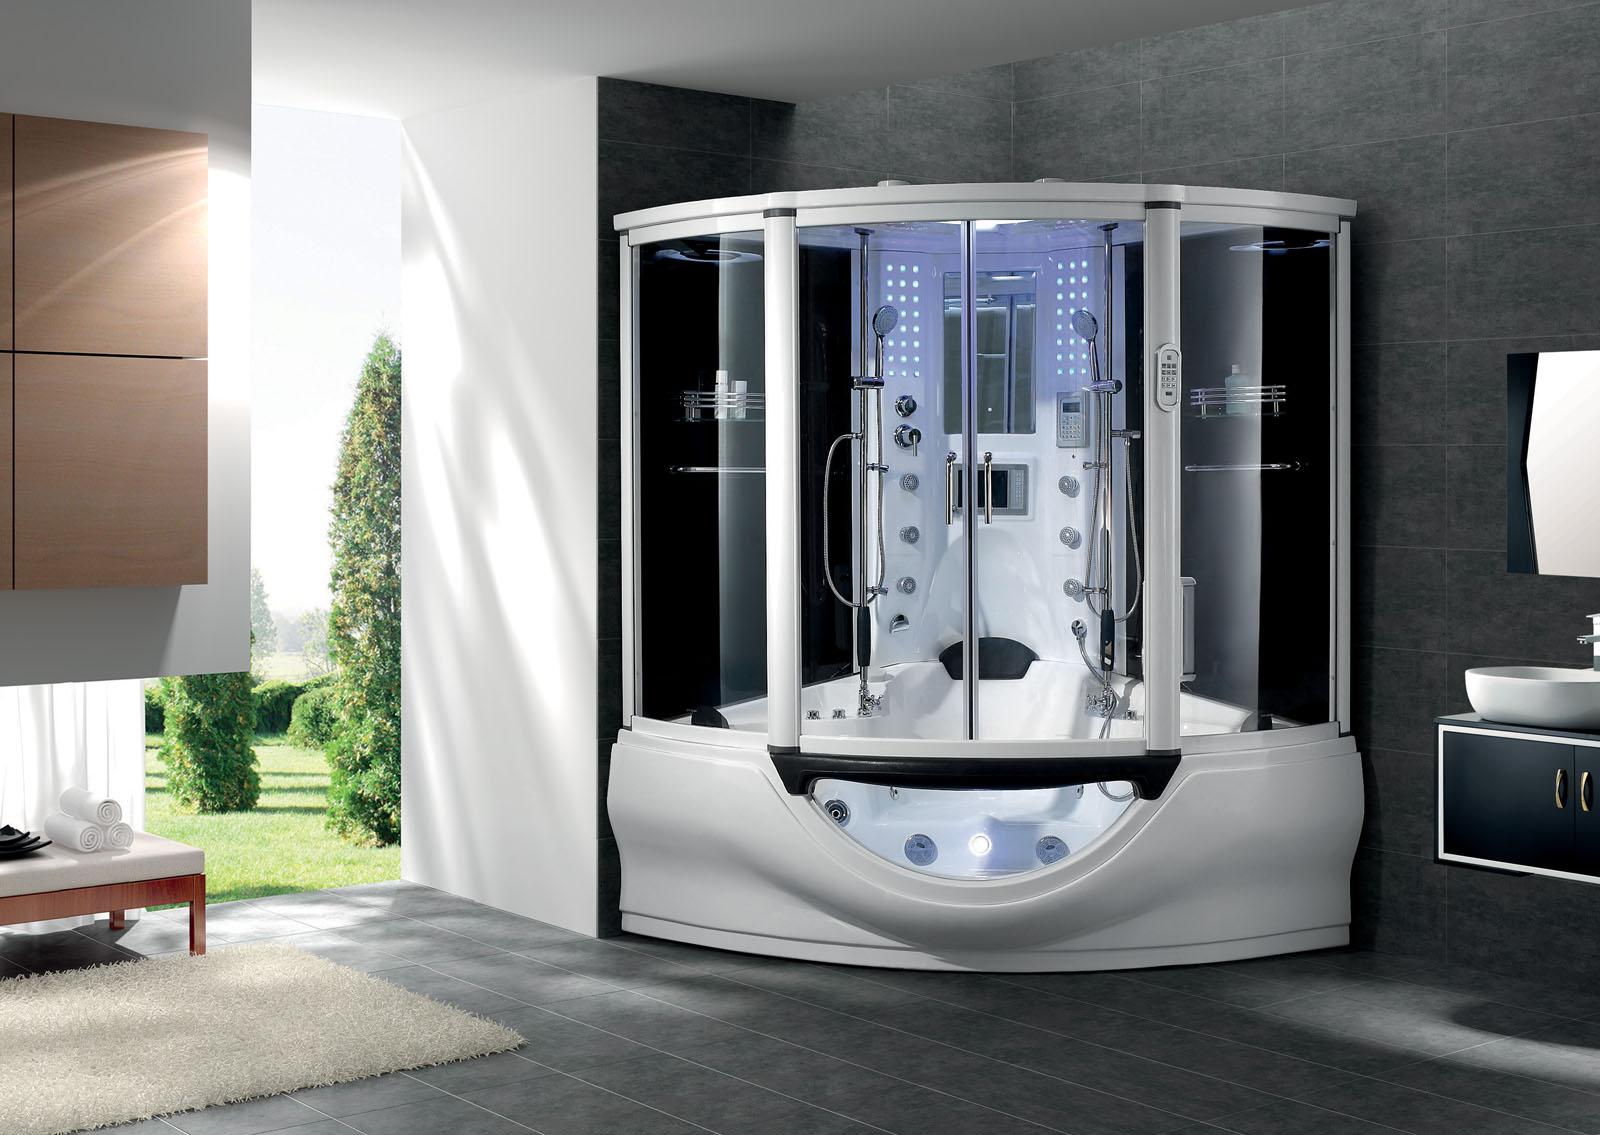 New 2012 Computerized Massage Jacuzzi Whirlpool Hot Tub Shower Steam Sauna SPA  eBay